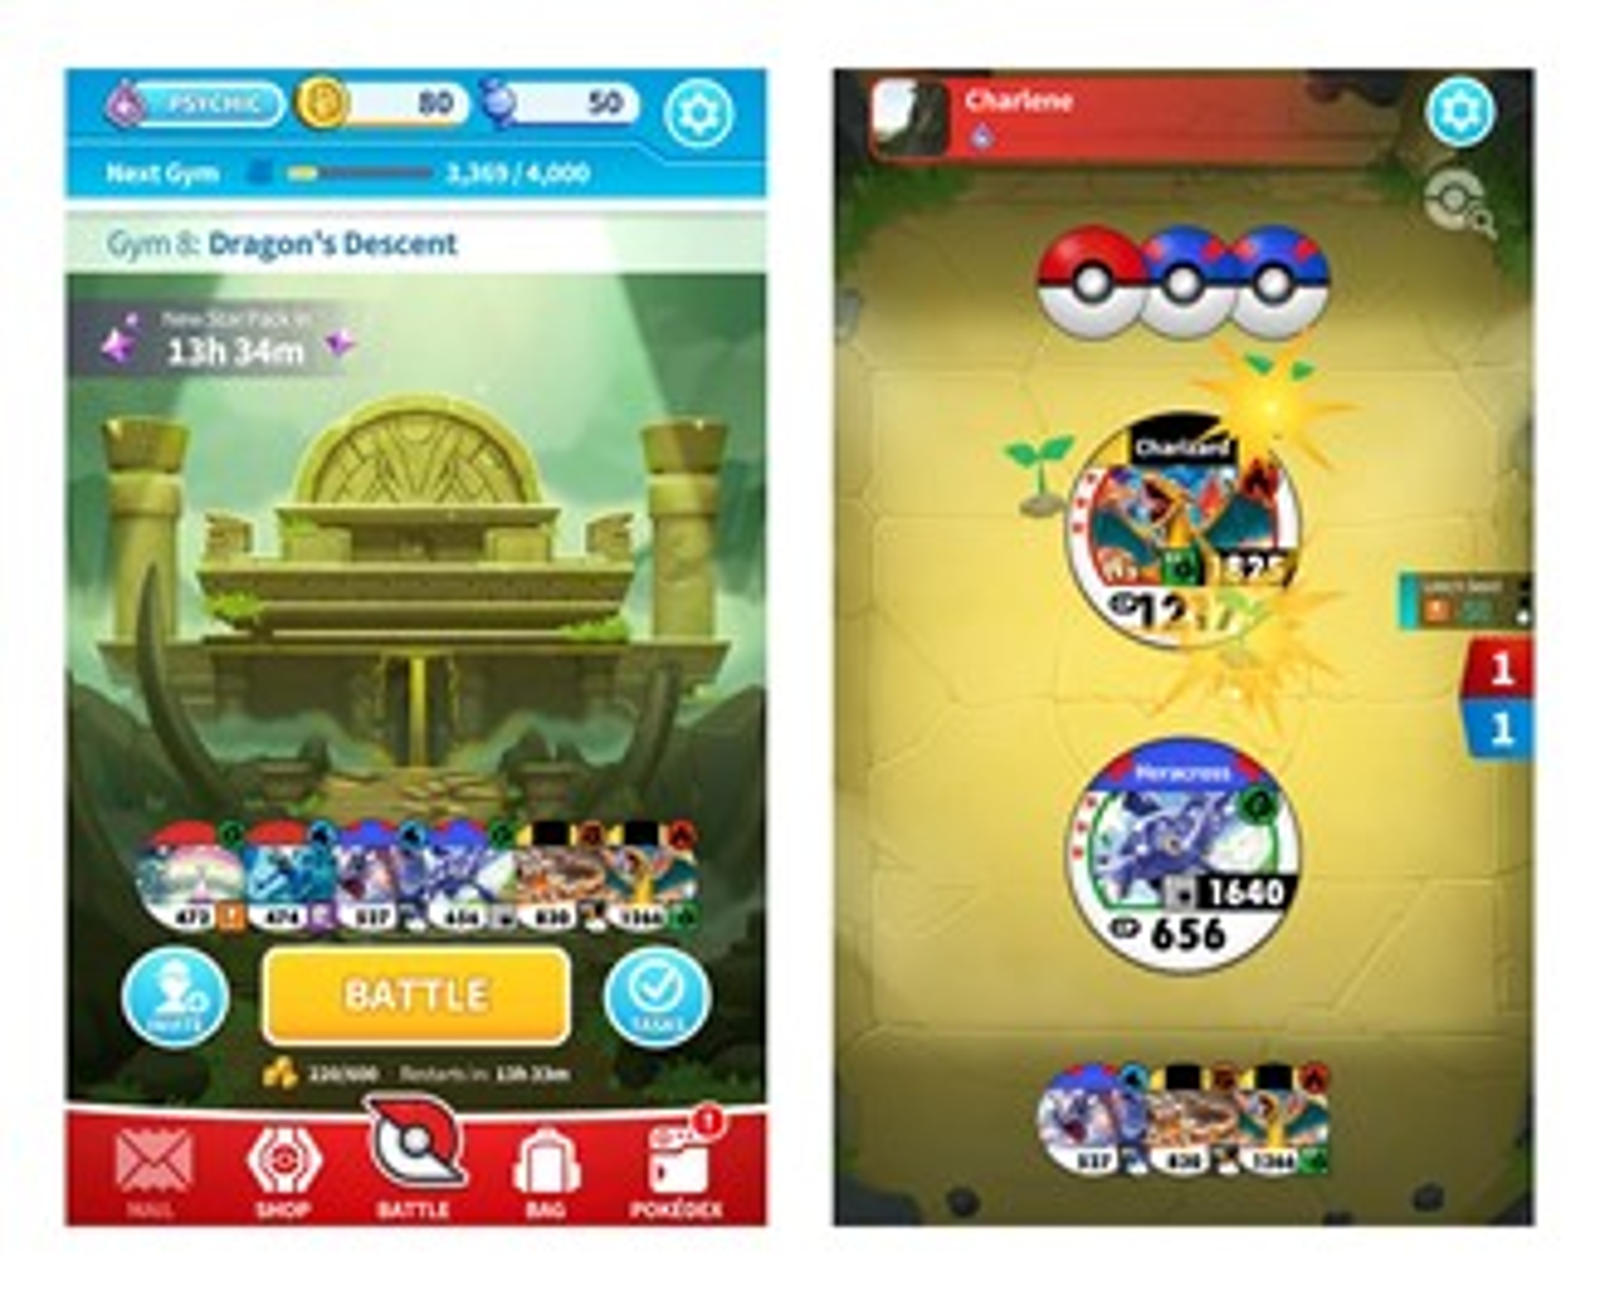 Pokemon Tower Battle and Medallion Battle arrive for Facebook